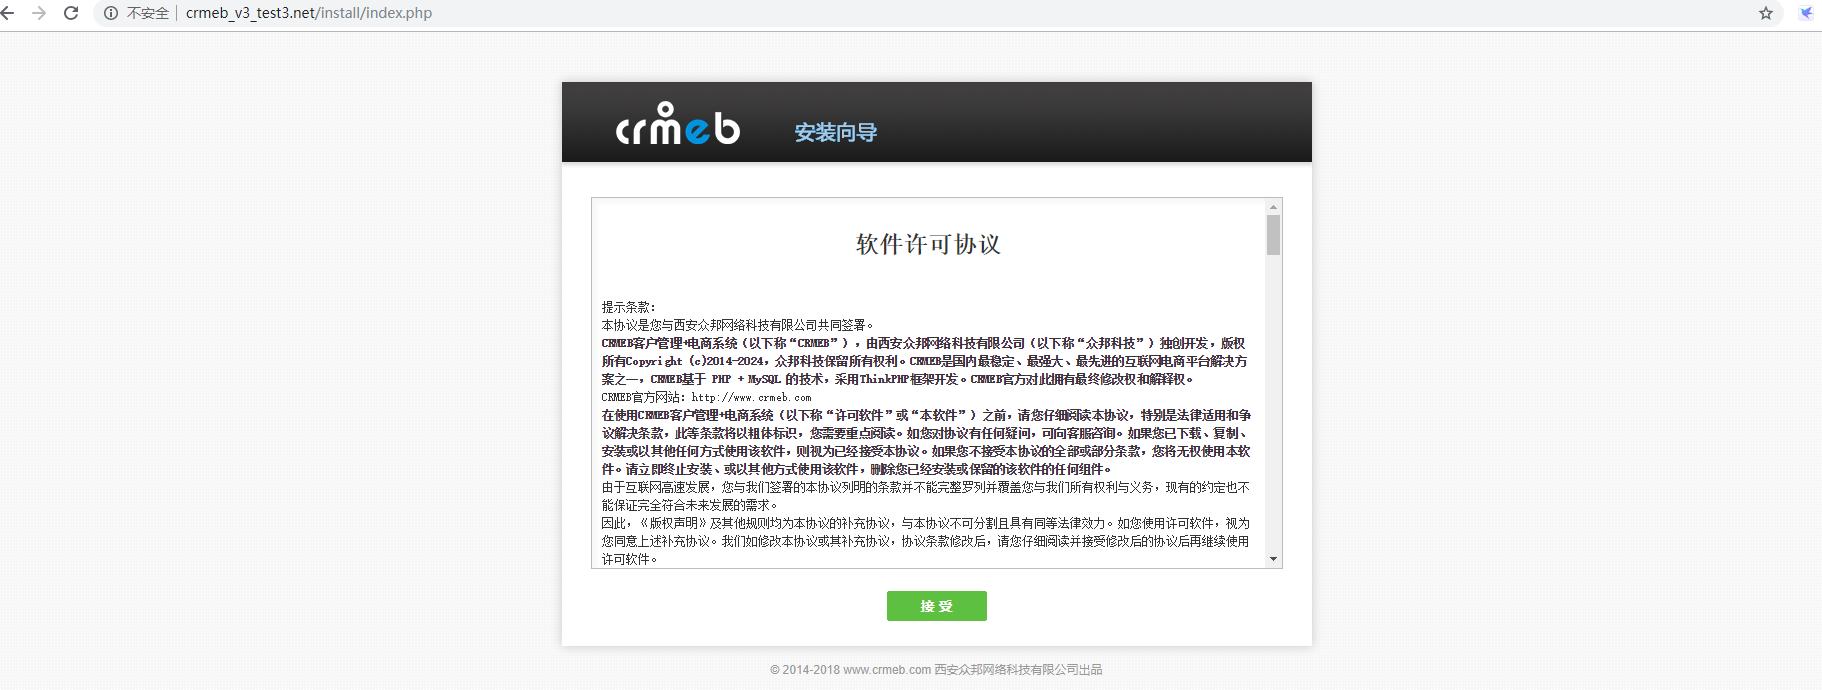 CRMEB知识付费系统 阿里云宝塔系统安装